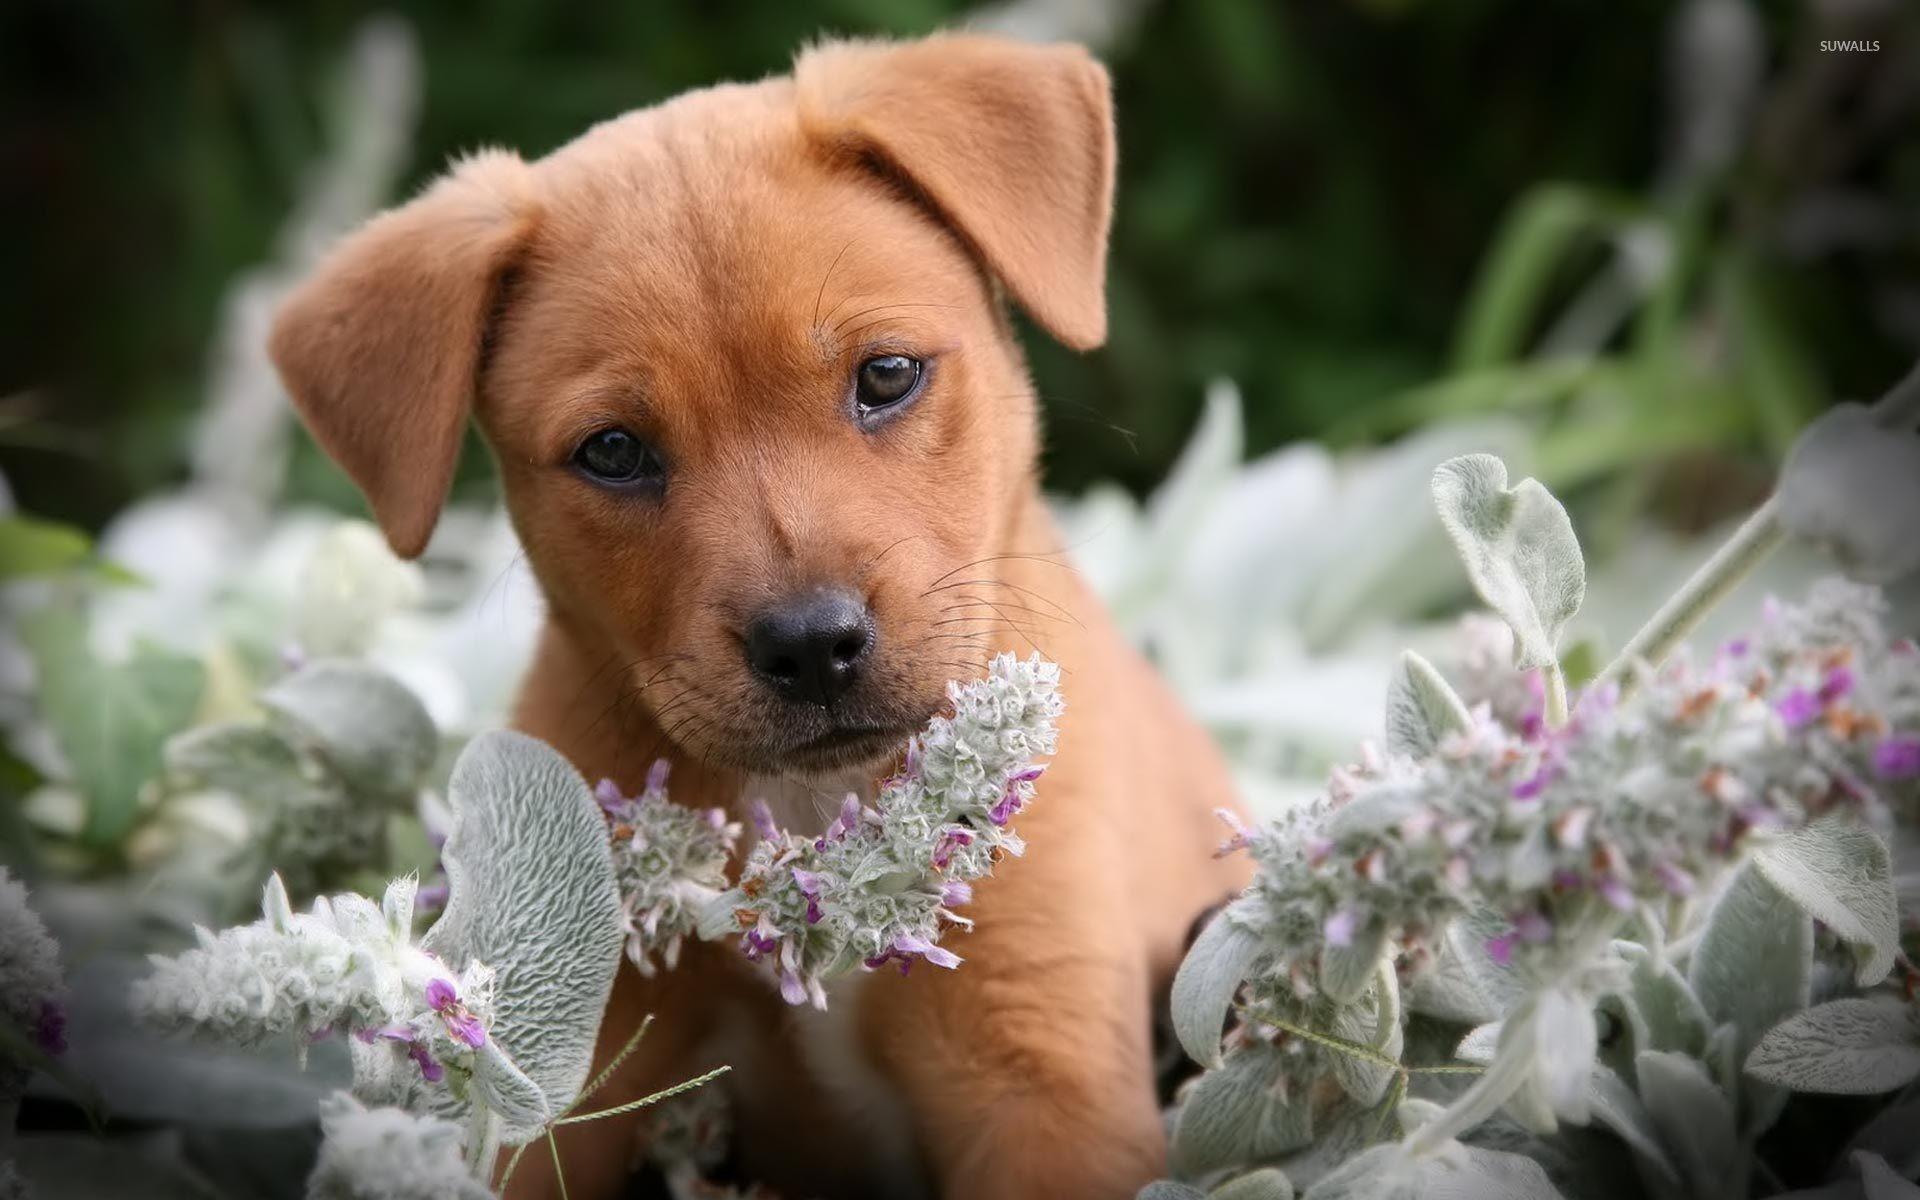 Cute brown puppy in the flowers wallpaper jpg